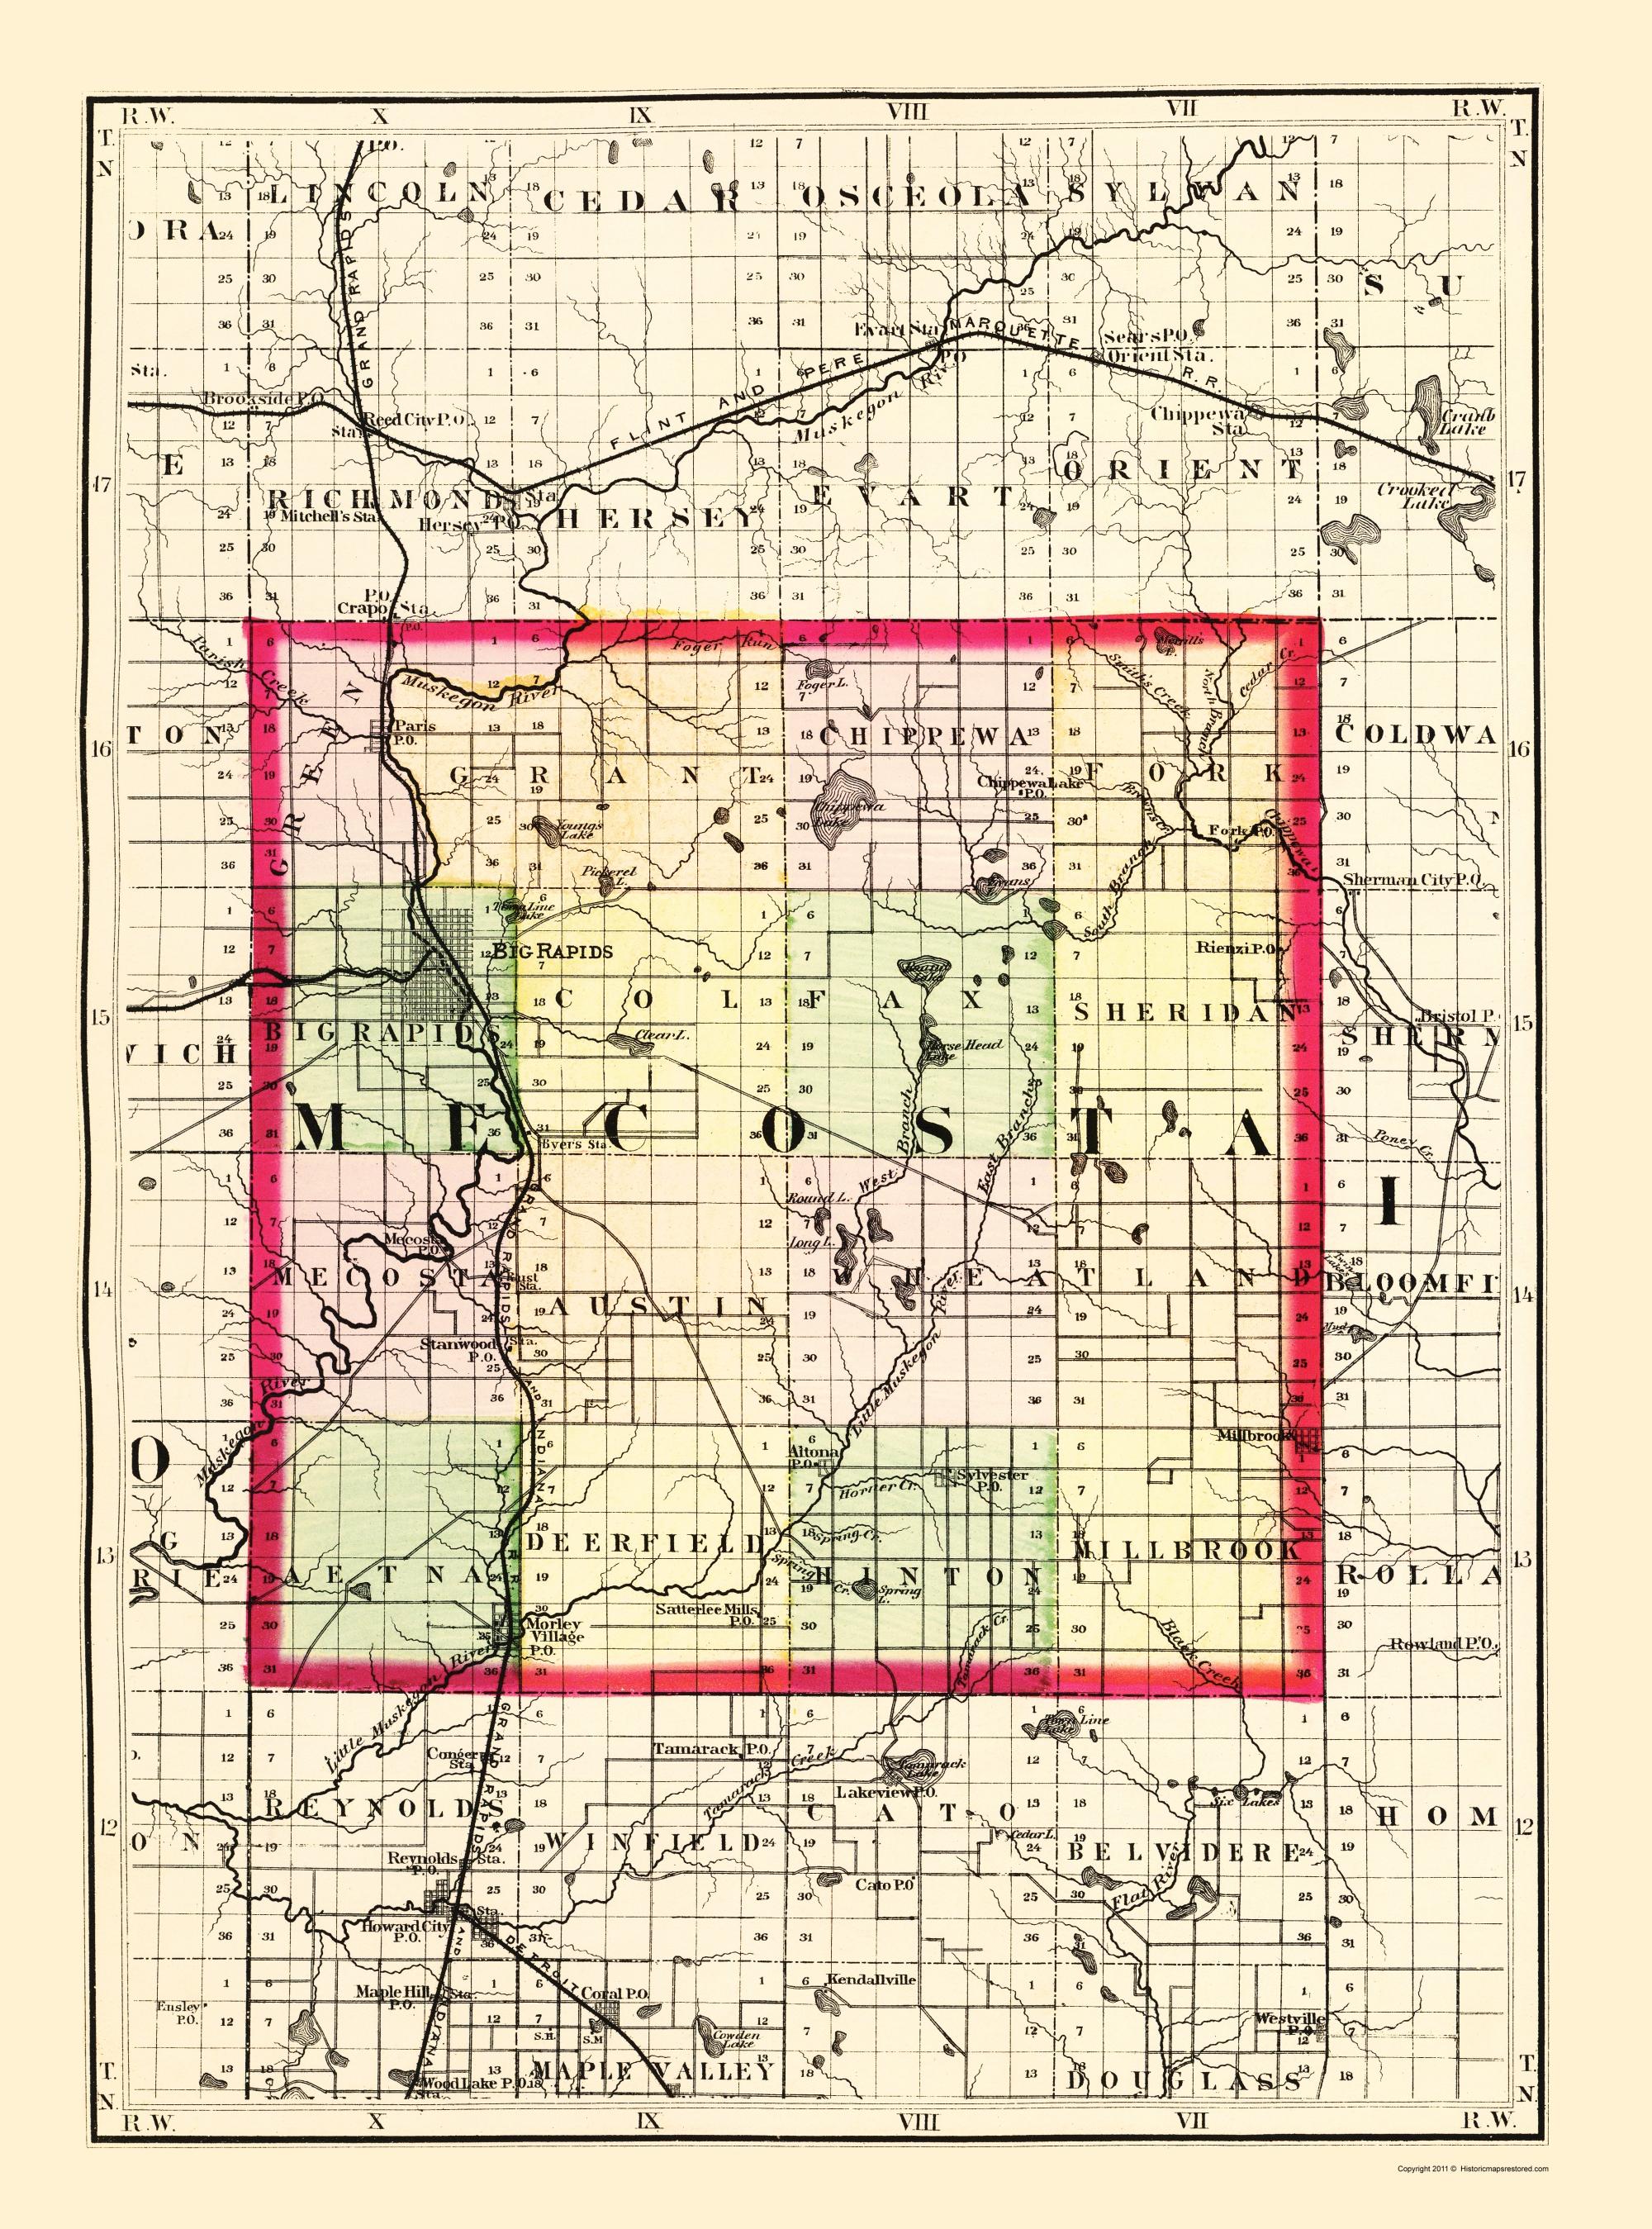 Mecosta Michigan Map.Old County Map Mecosta Michigan Tackabury 1873